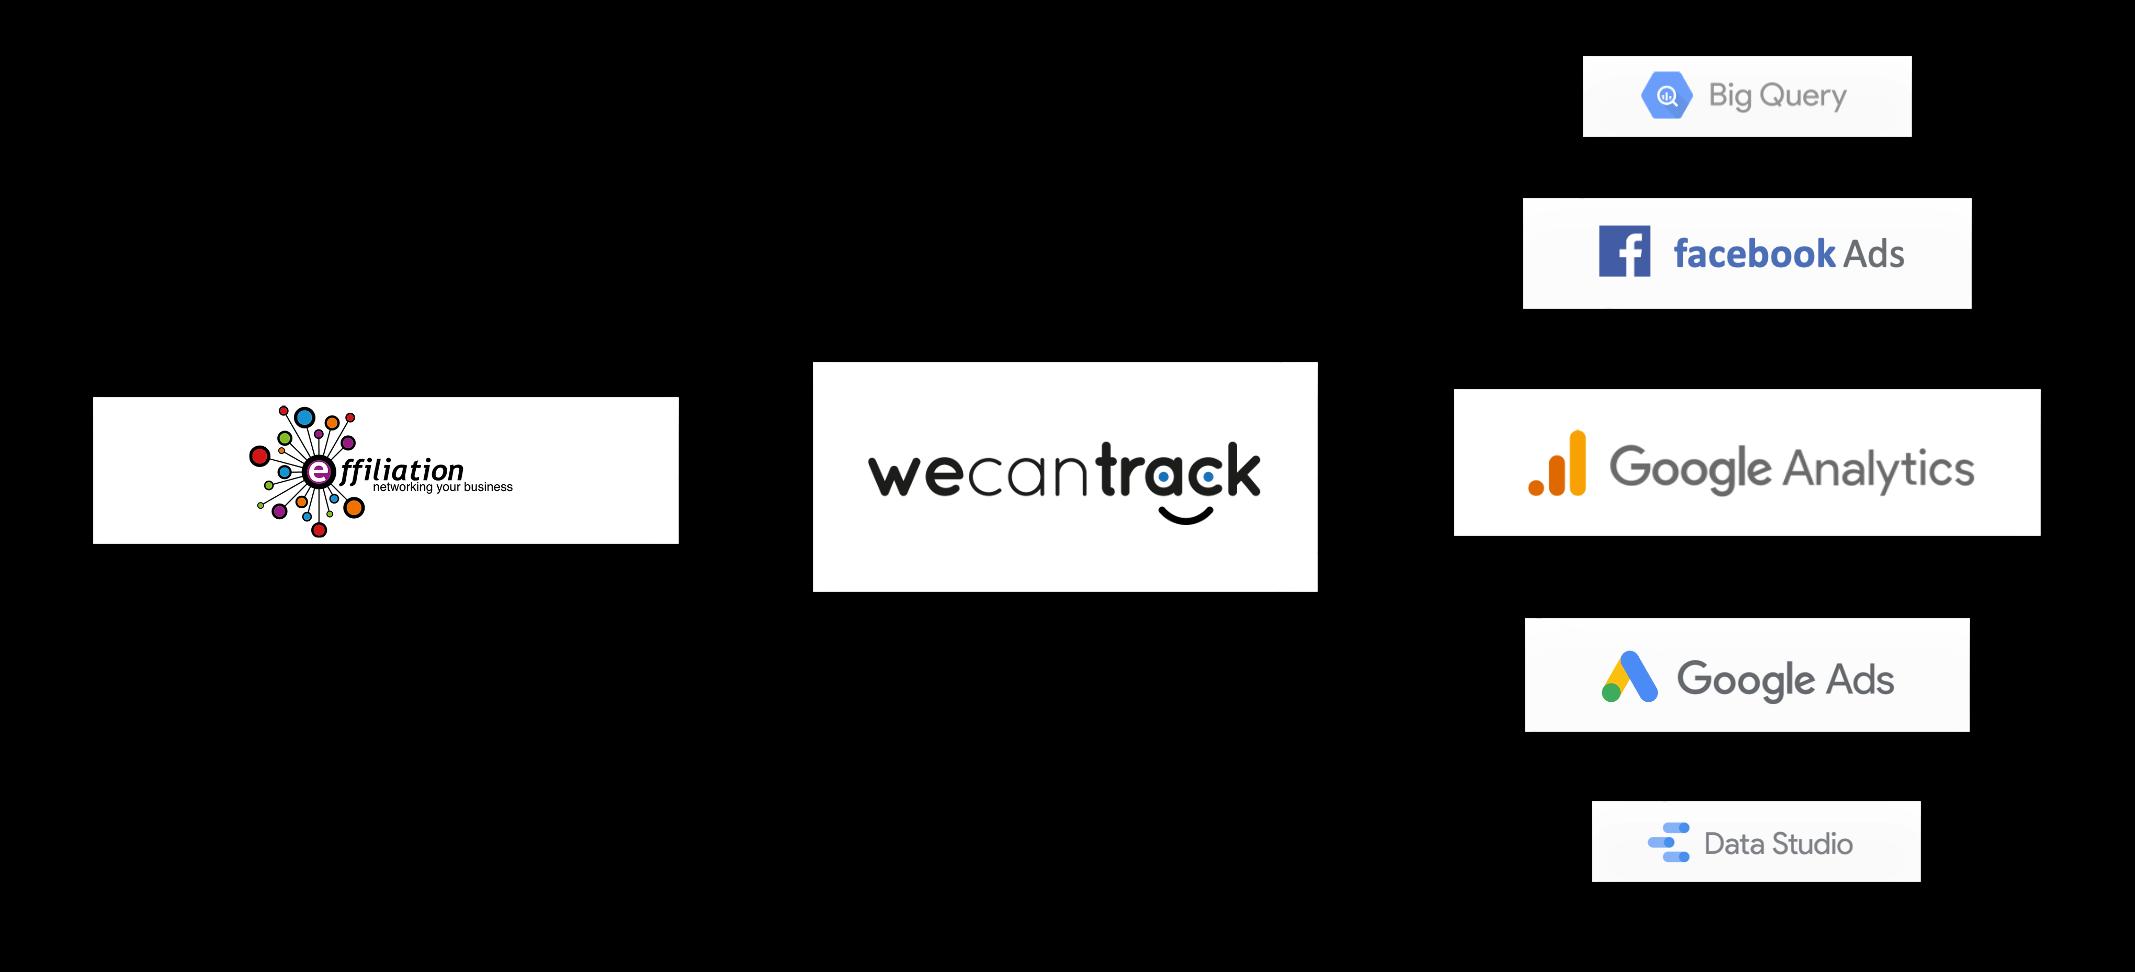 effiliation-affiliate-conversion-integration-via-api